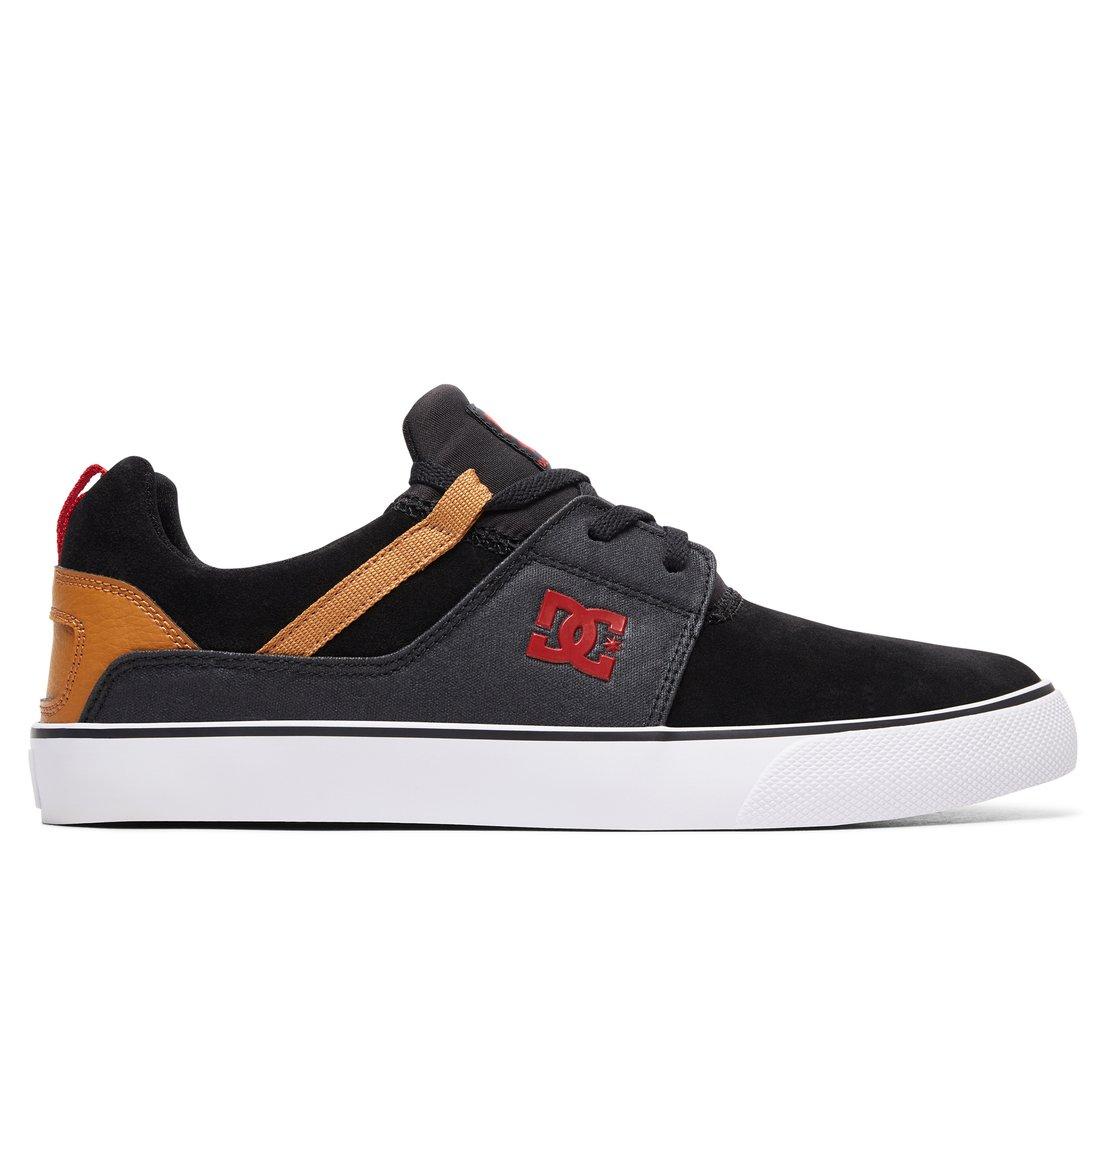 DC Shoes Heathrow Vulc, Chaussures de Skateboard Homme, Noir (Black Bl0), 47 EU